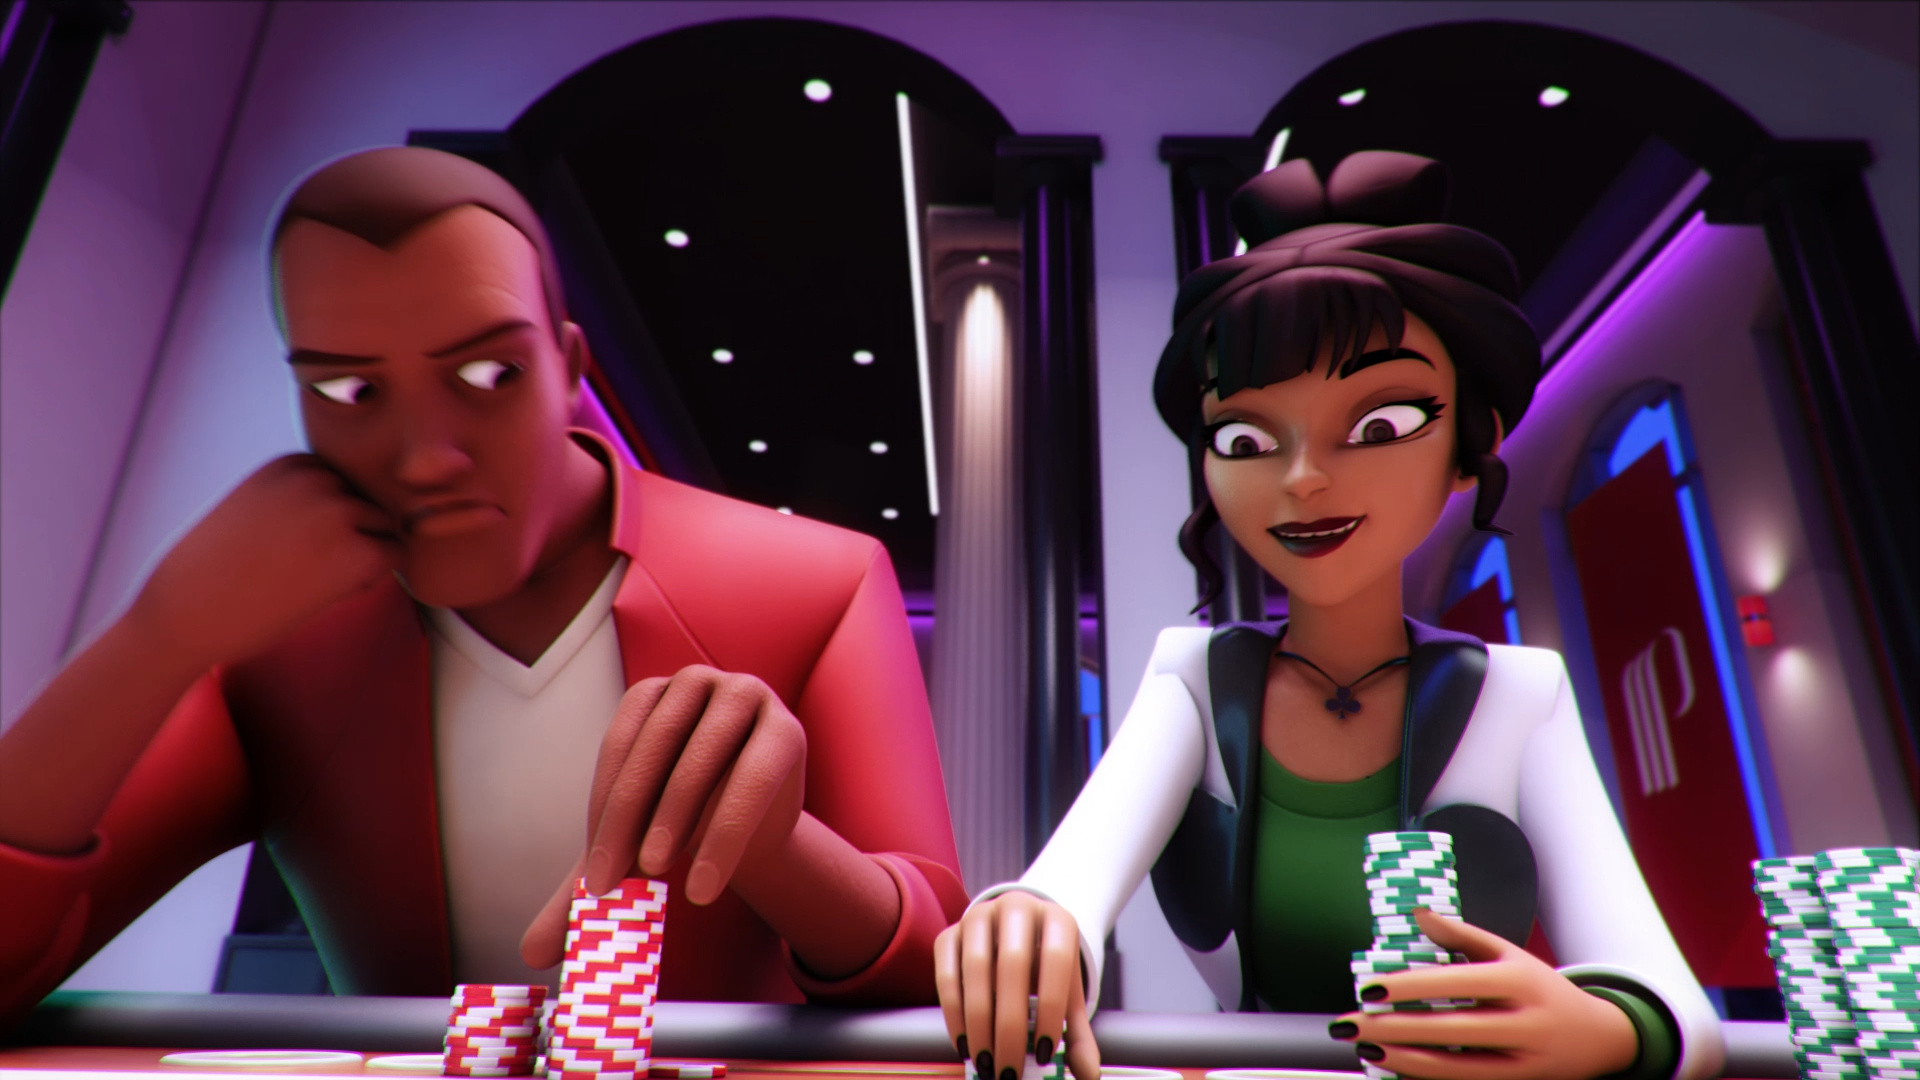 Dripmoon Studio de production animation 3D